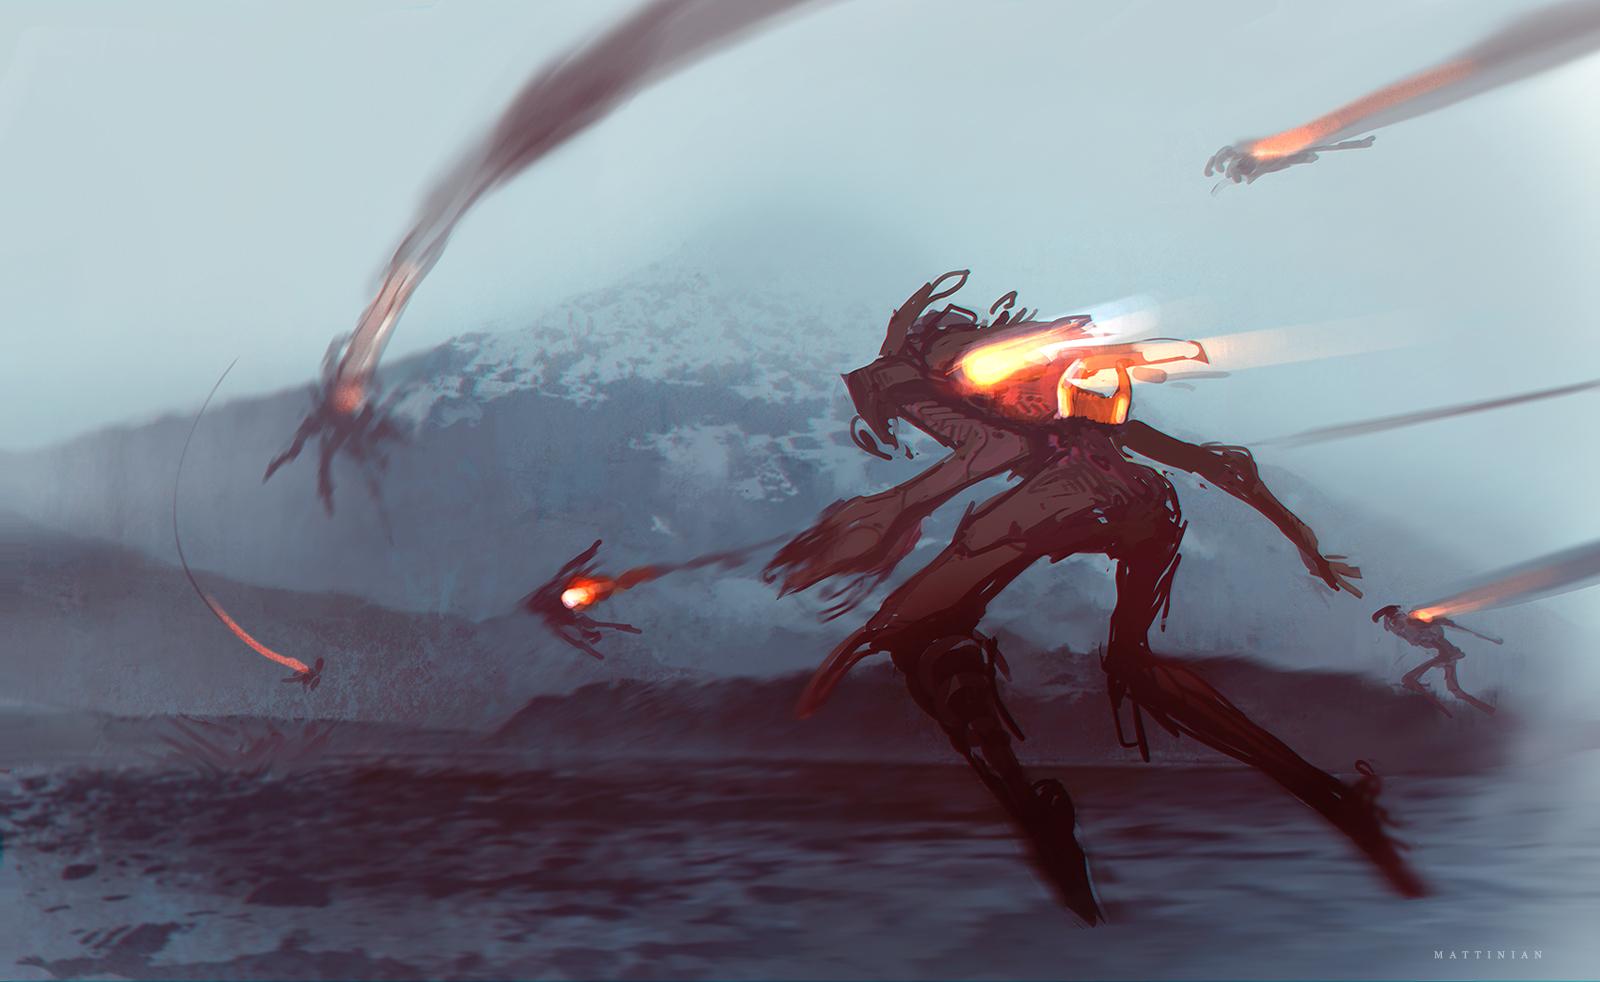 sci-fi sketch_2 by Mattinian